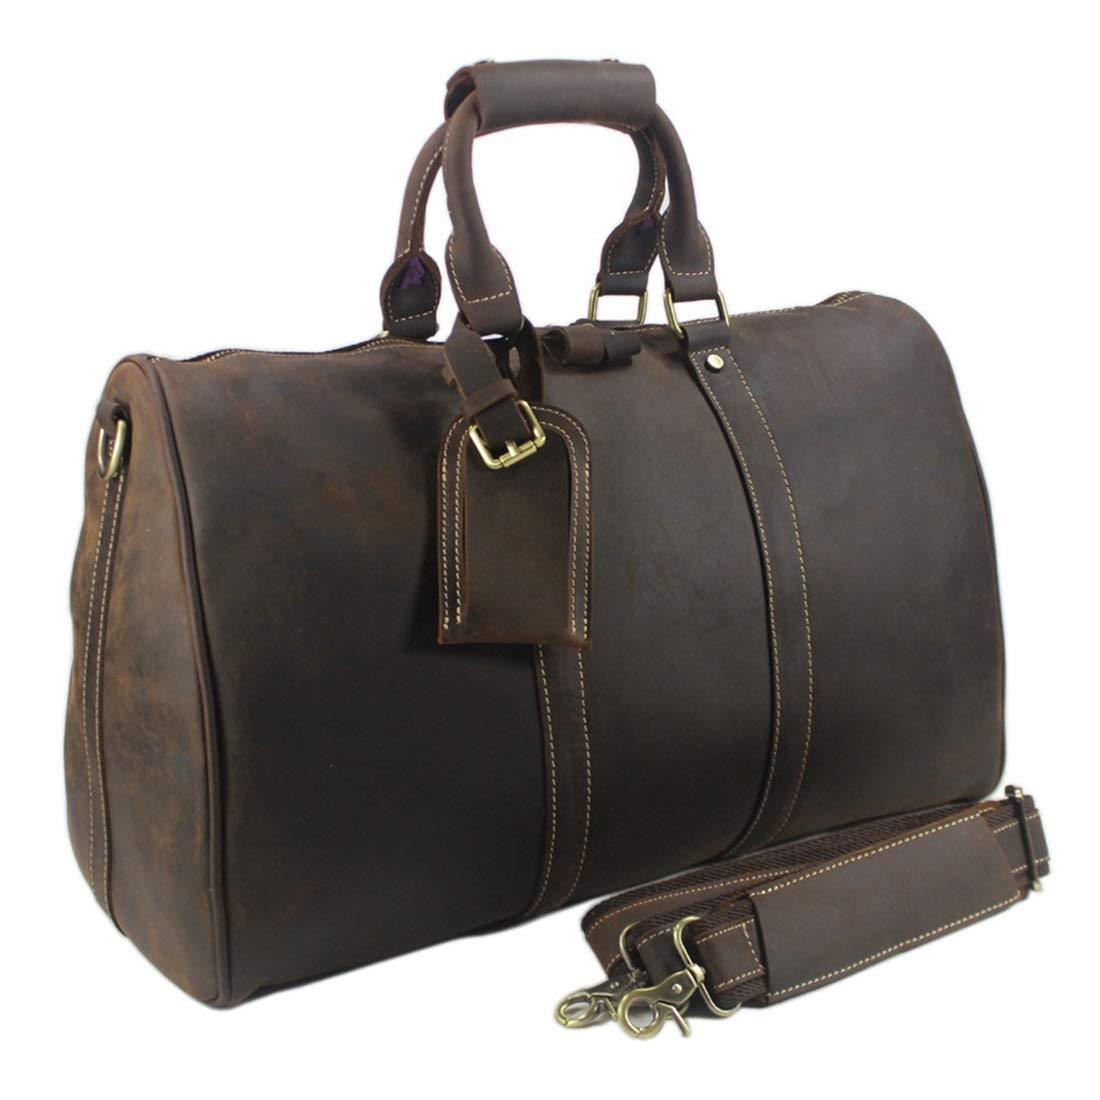 Vergeania 男性旅行バッグキャリングバッグ本革大容量荷物レザークロスボディバッグ手荷物折りたたみ式荷物スポーツベルトフィットネスバッグ防水バッグ大型荷物 (色 : ブラウン) B07S2BH9QX ブラウン